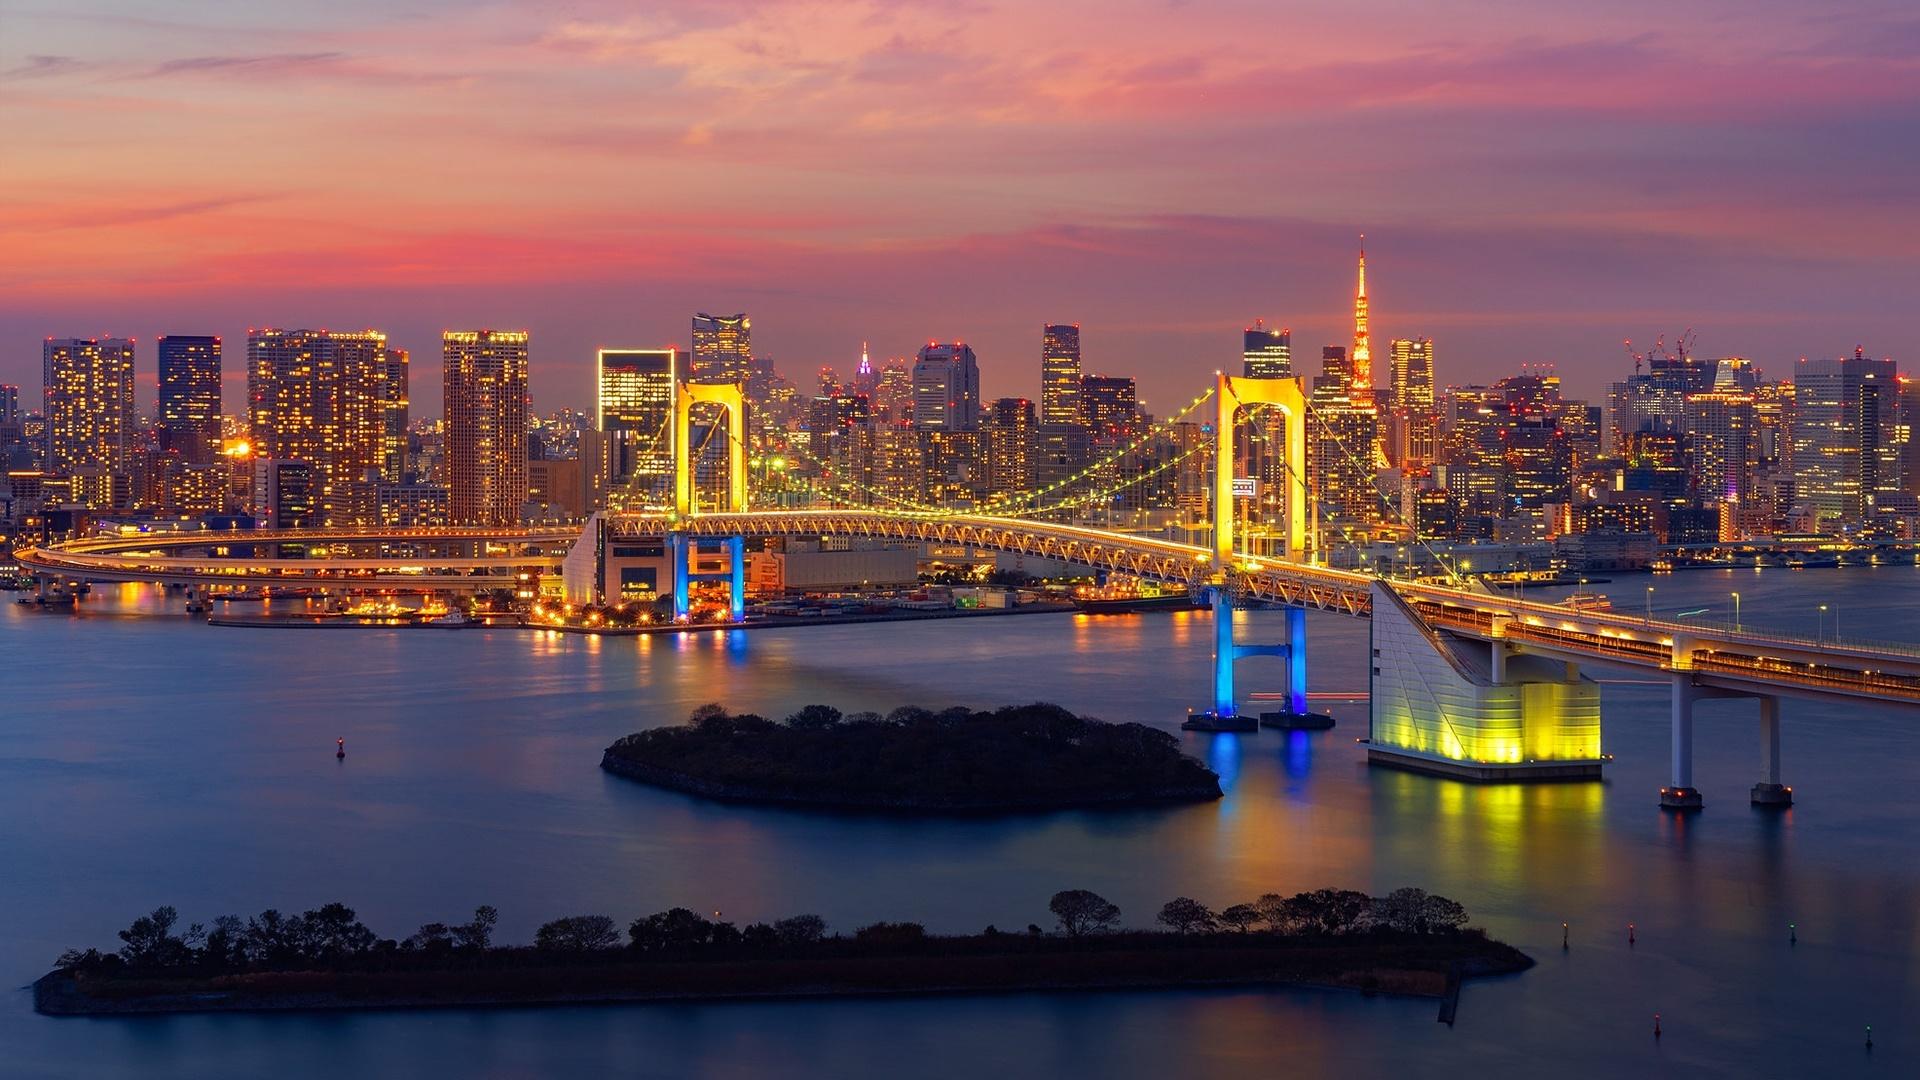 Rainbow Bridge At Evening Japan Hd Wallpaper